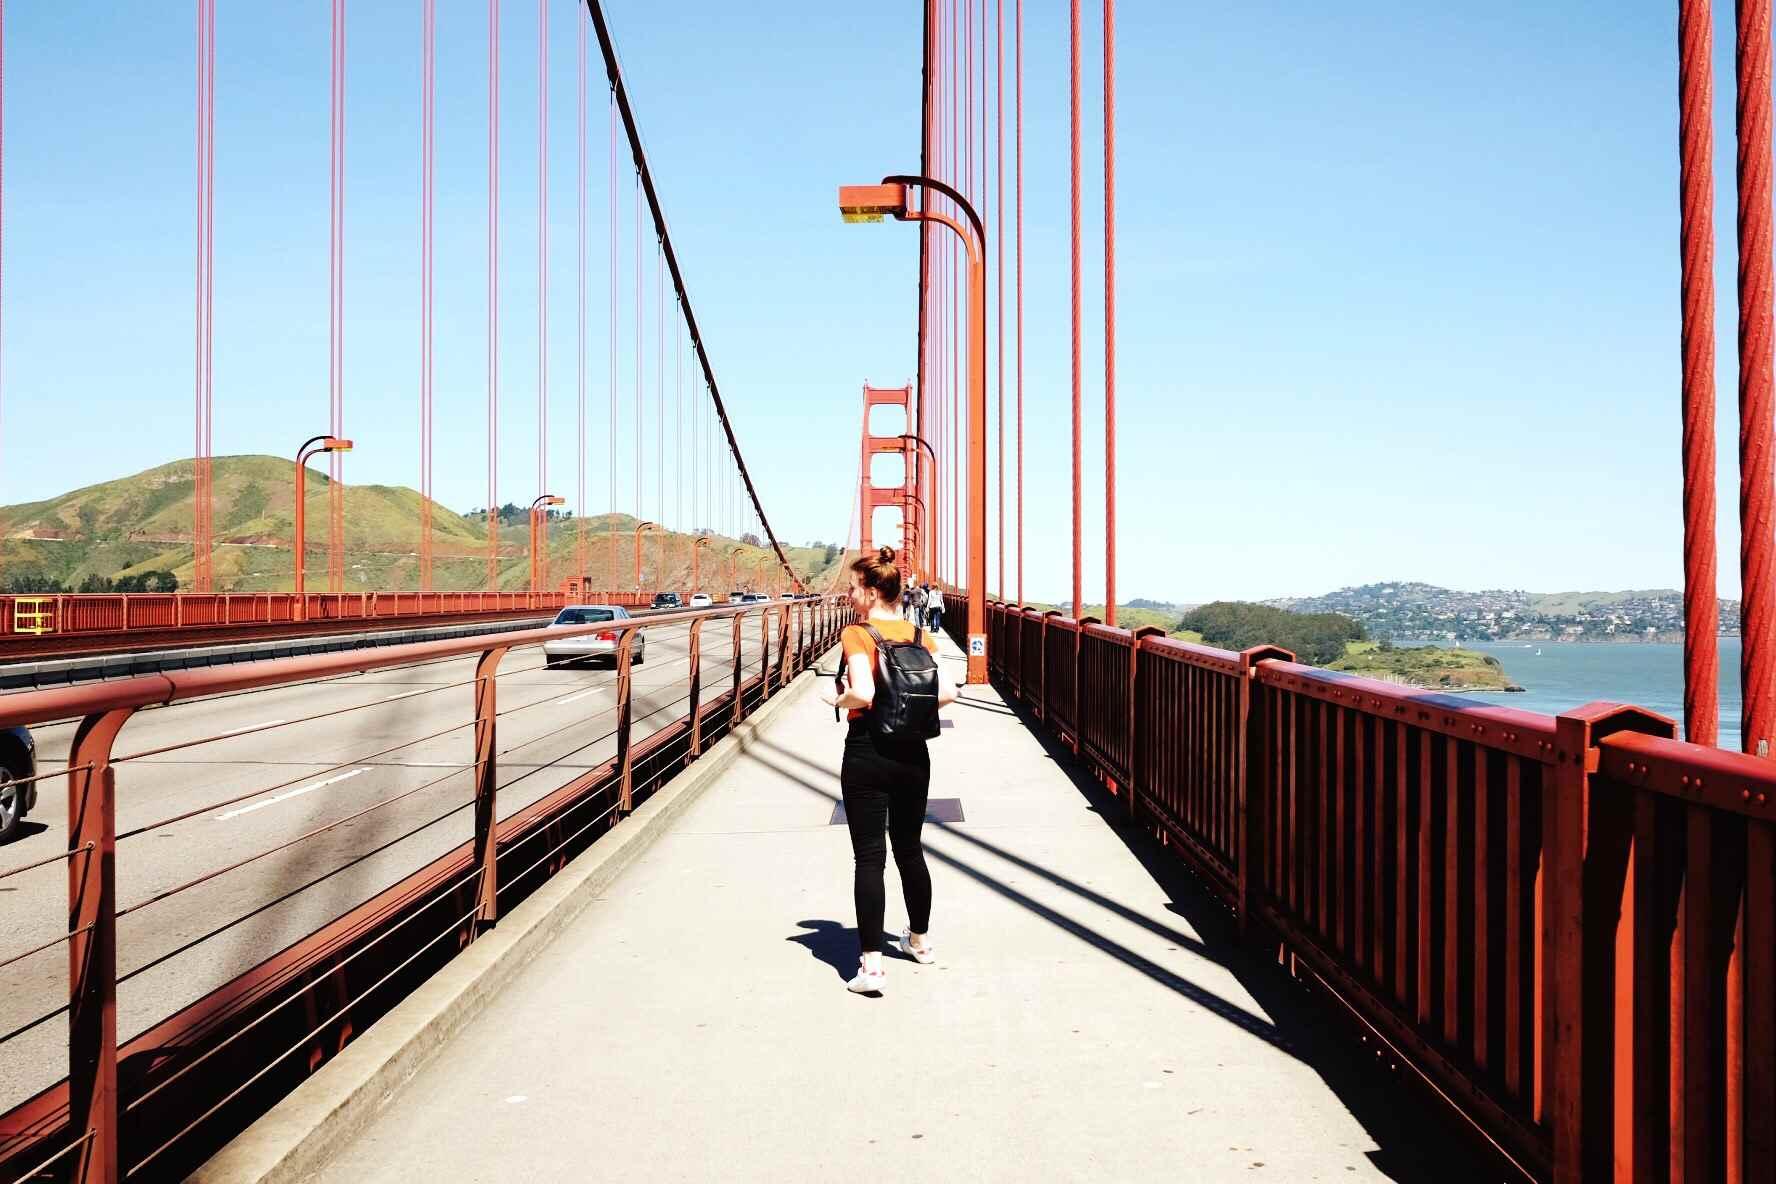 Fort Point National Historic Site Under The Golden Gate Bridge